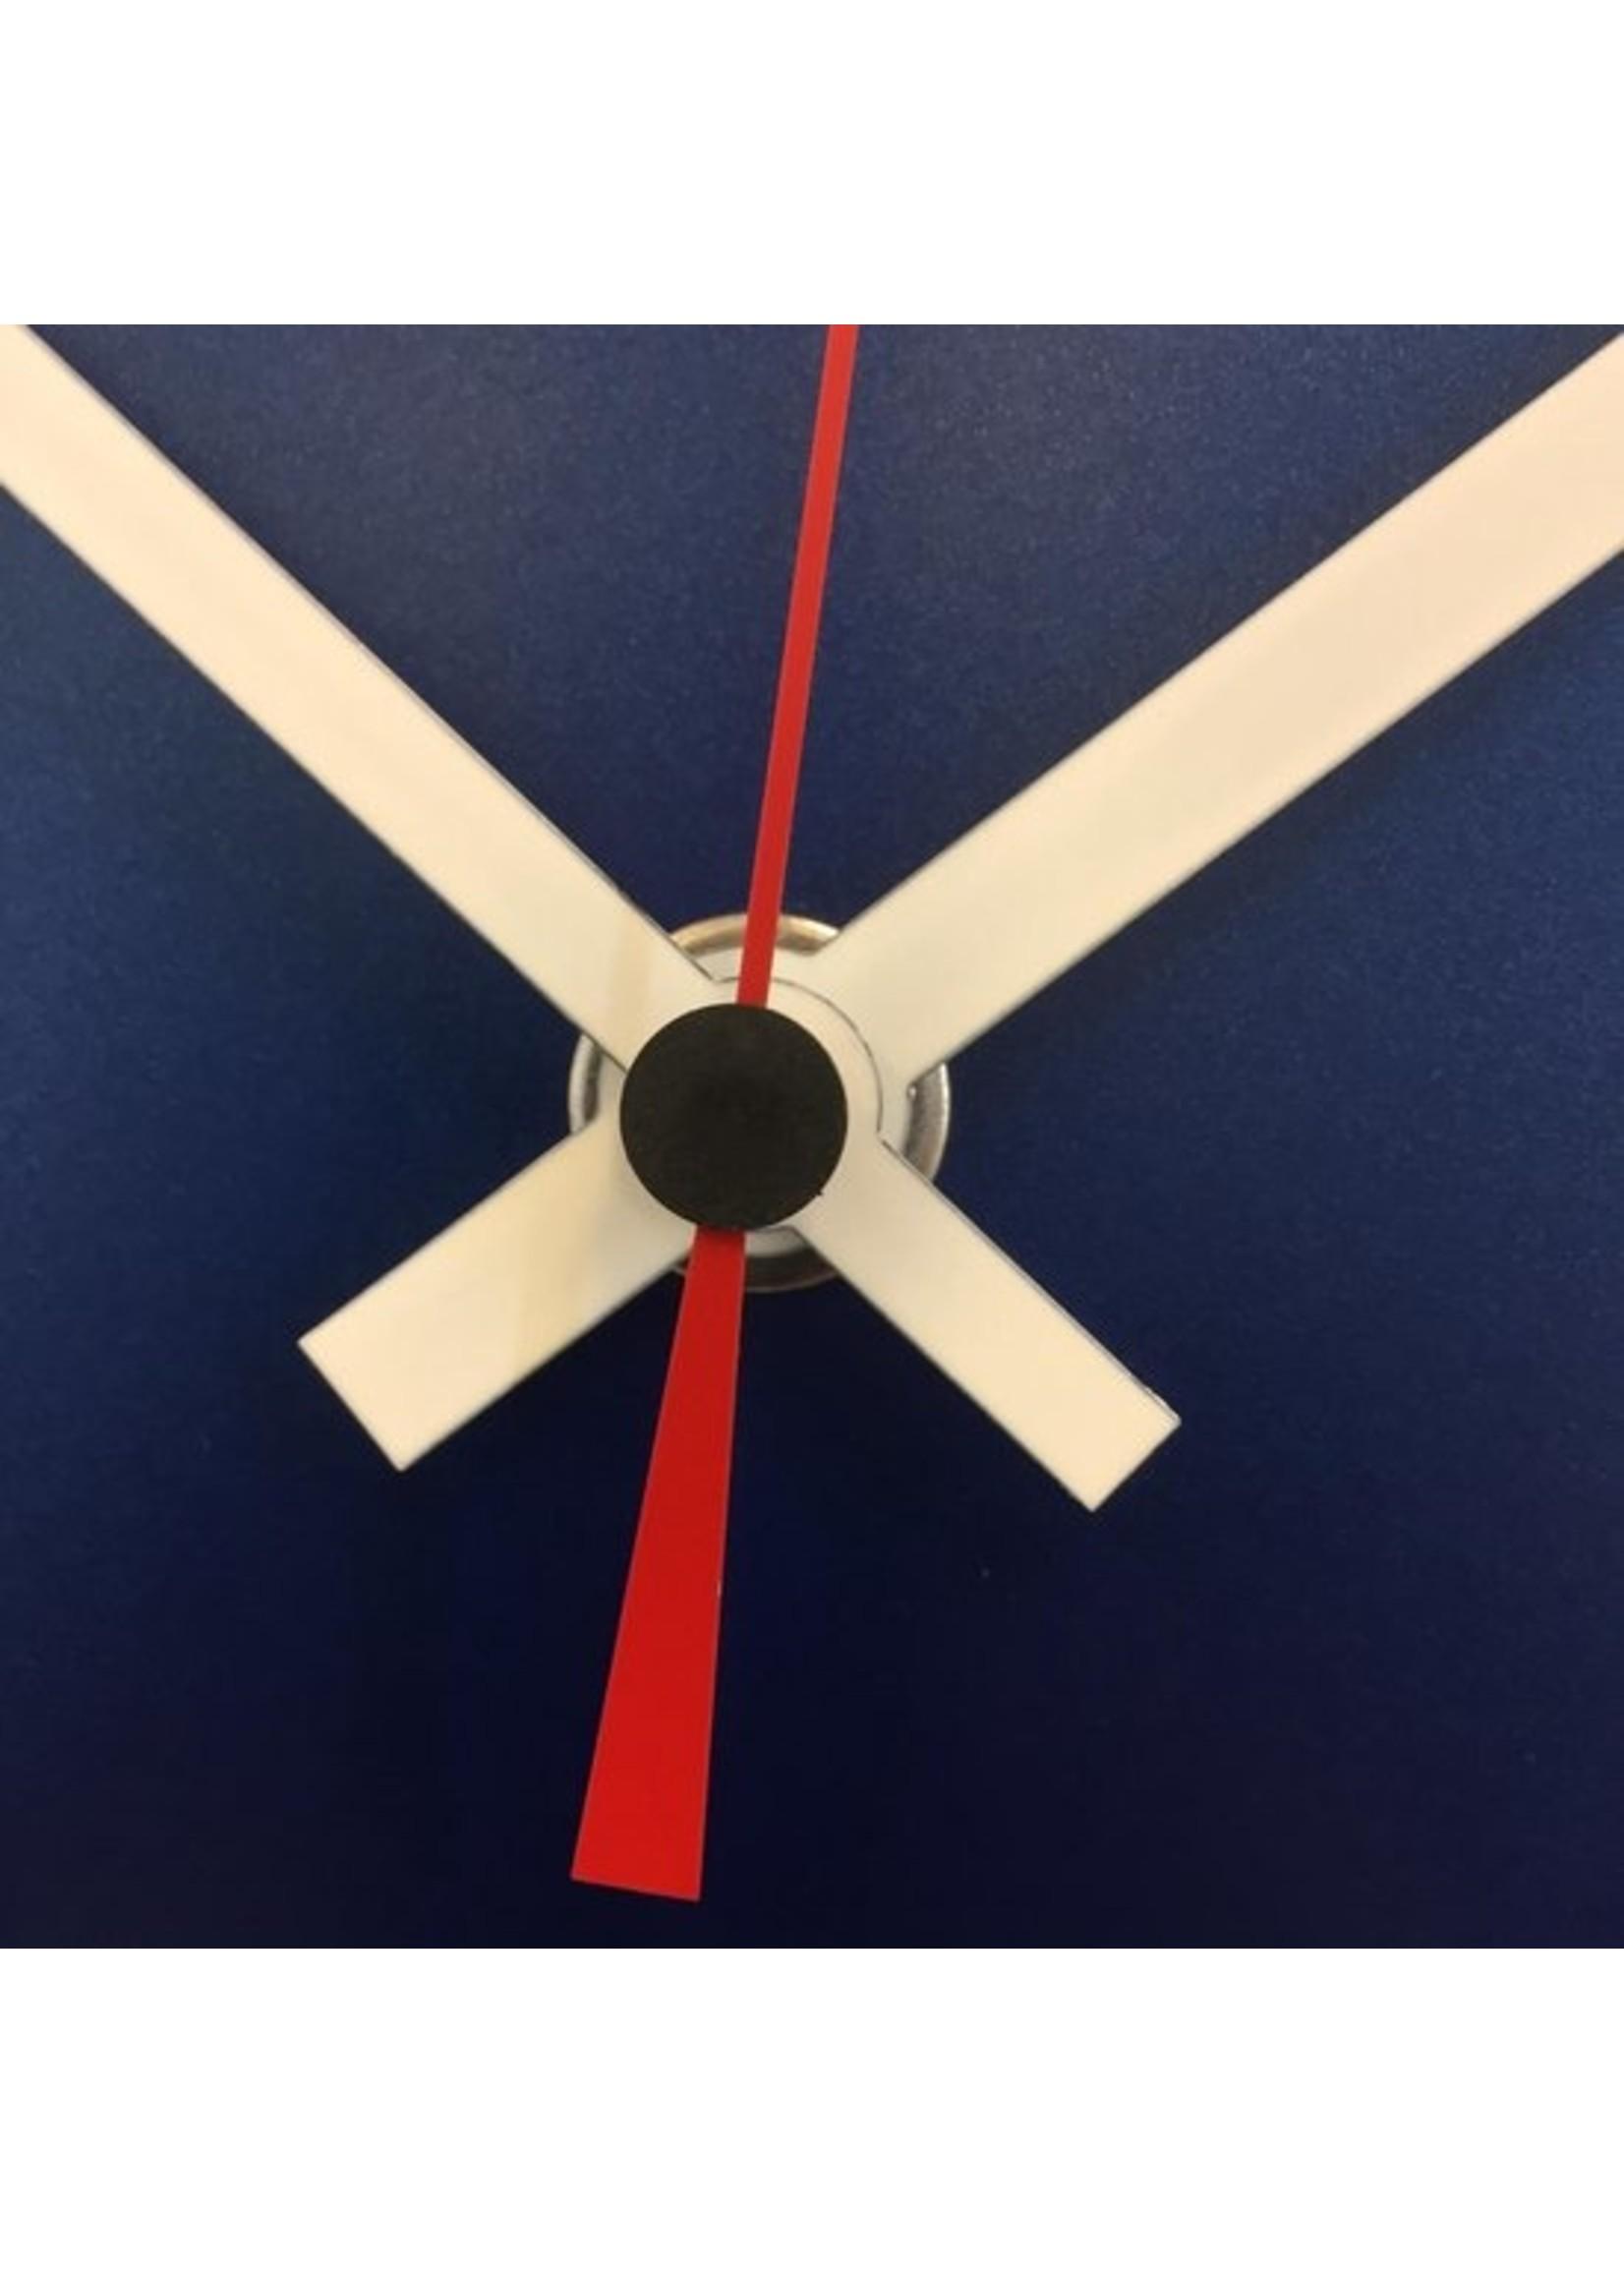 ChantalBrandO Wandklok RAPSODIE IN BLUE & RED MODERN DUTCH DESIGN